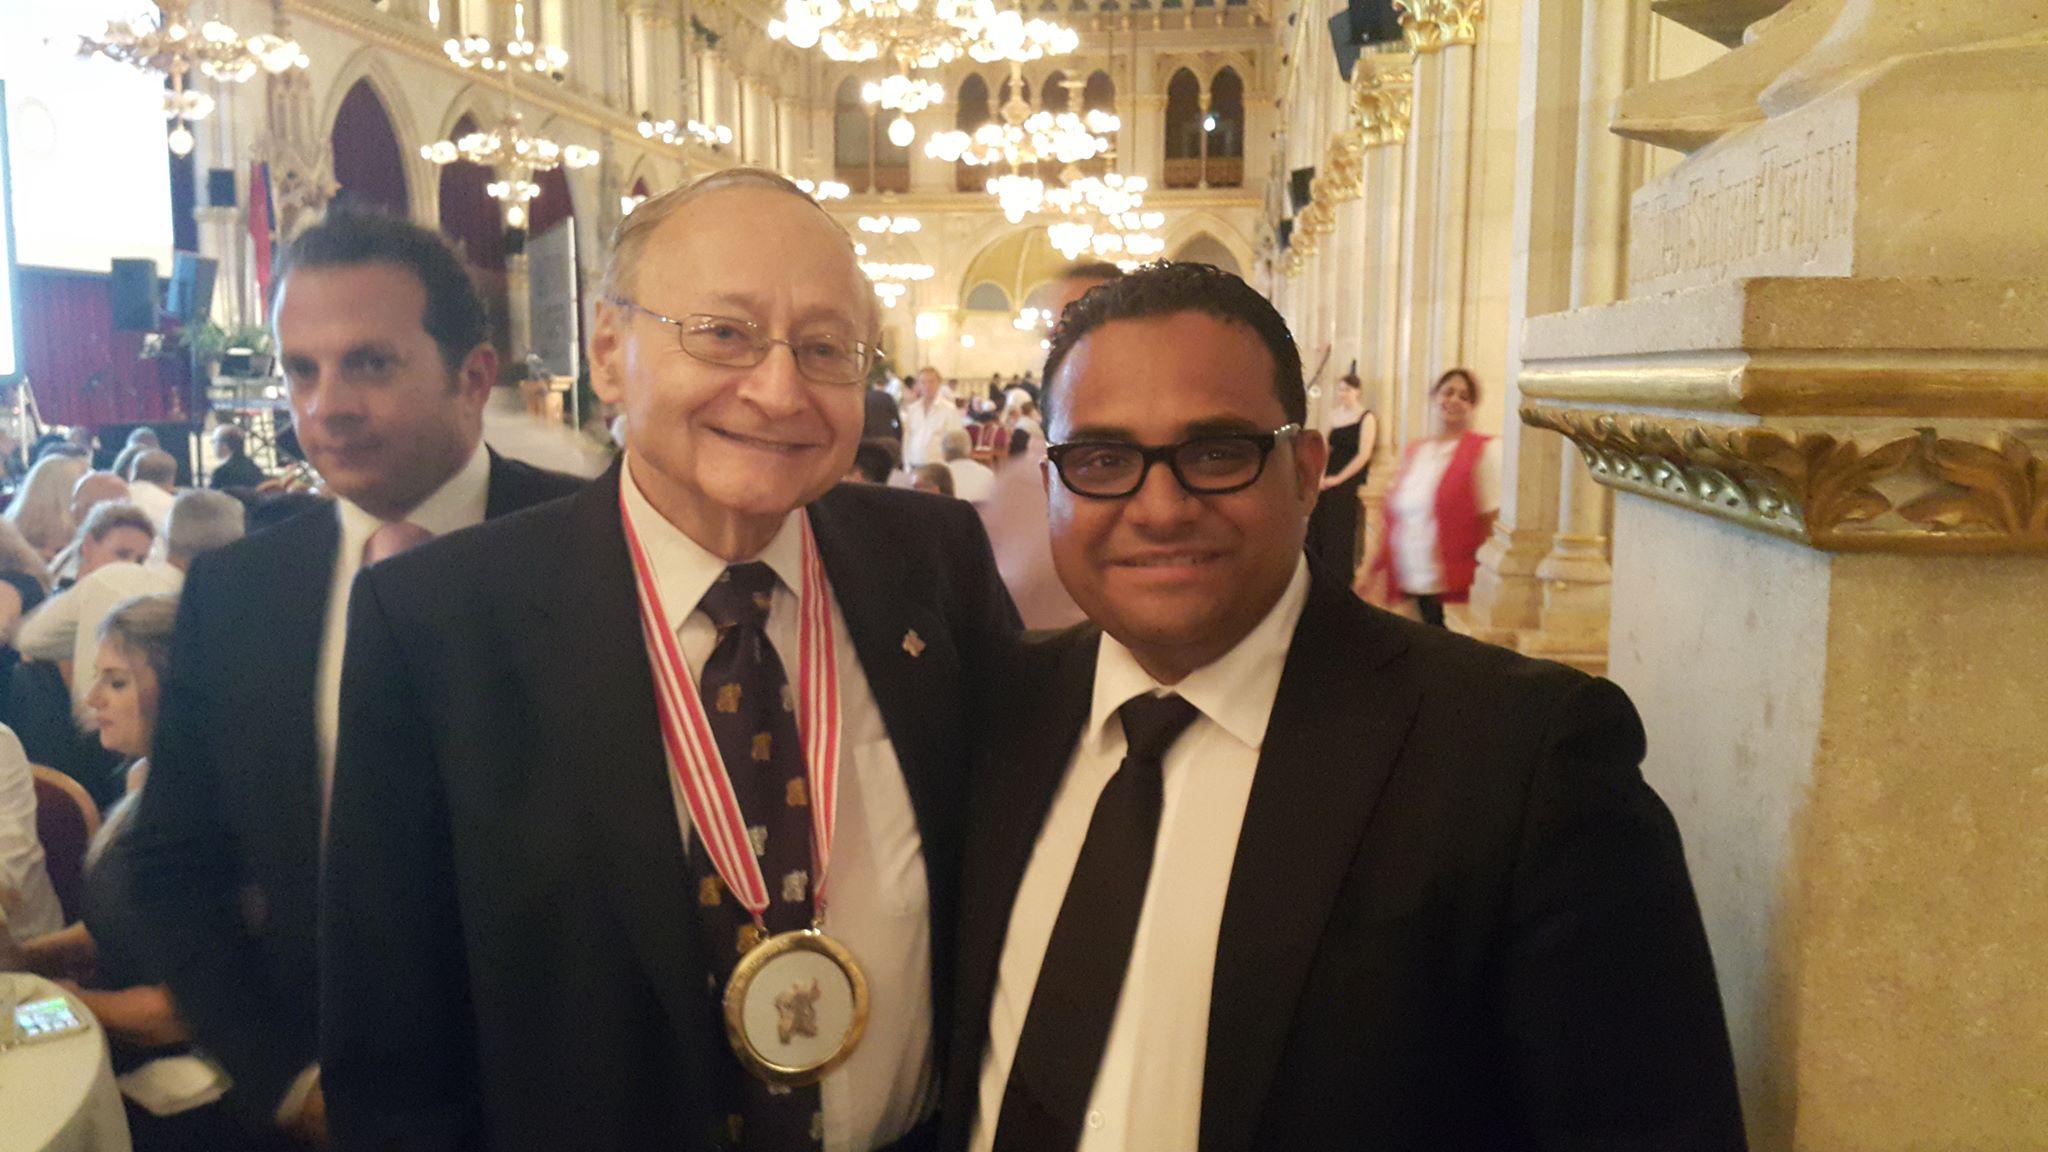 Mervyn Deitel and Ahmed M. Frieg (Forrig) of Alexandria at IFSO Vienna Ball Aug. 28, 2015